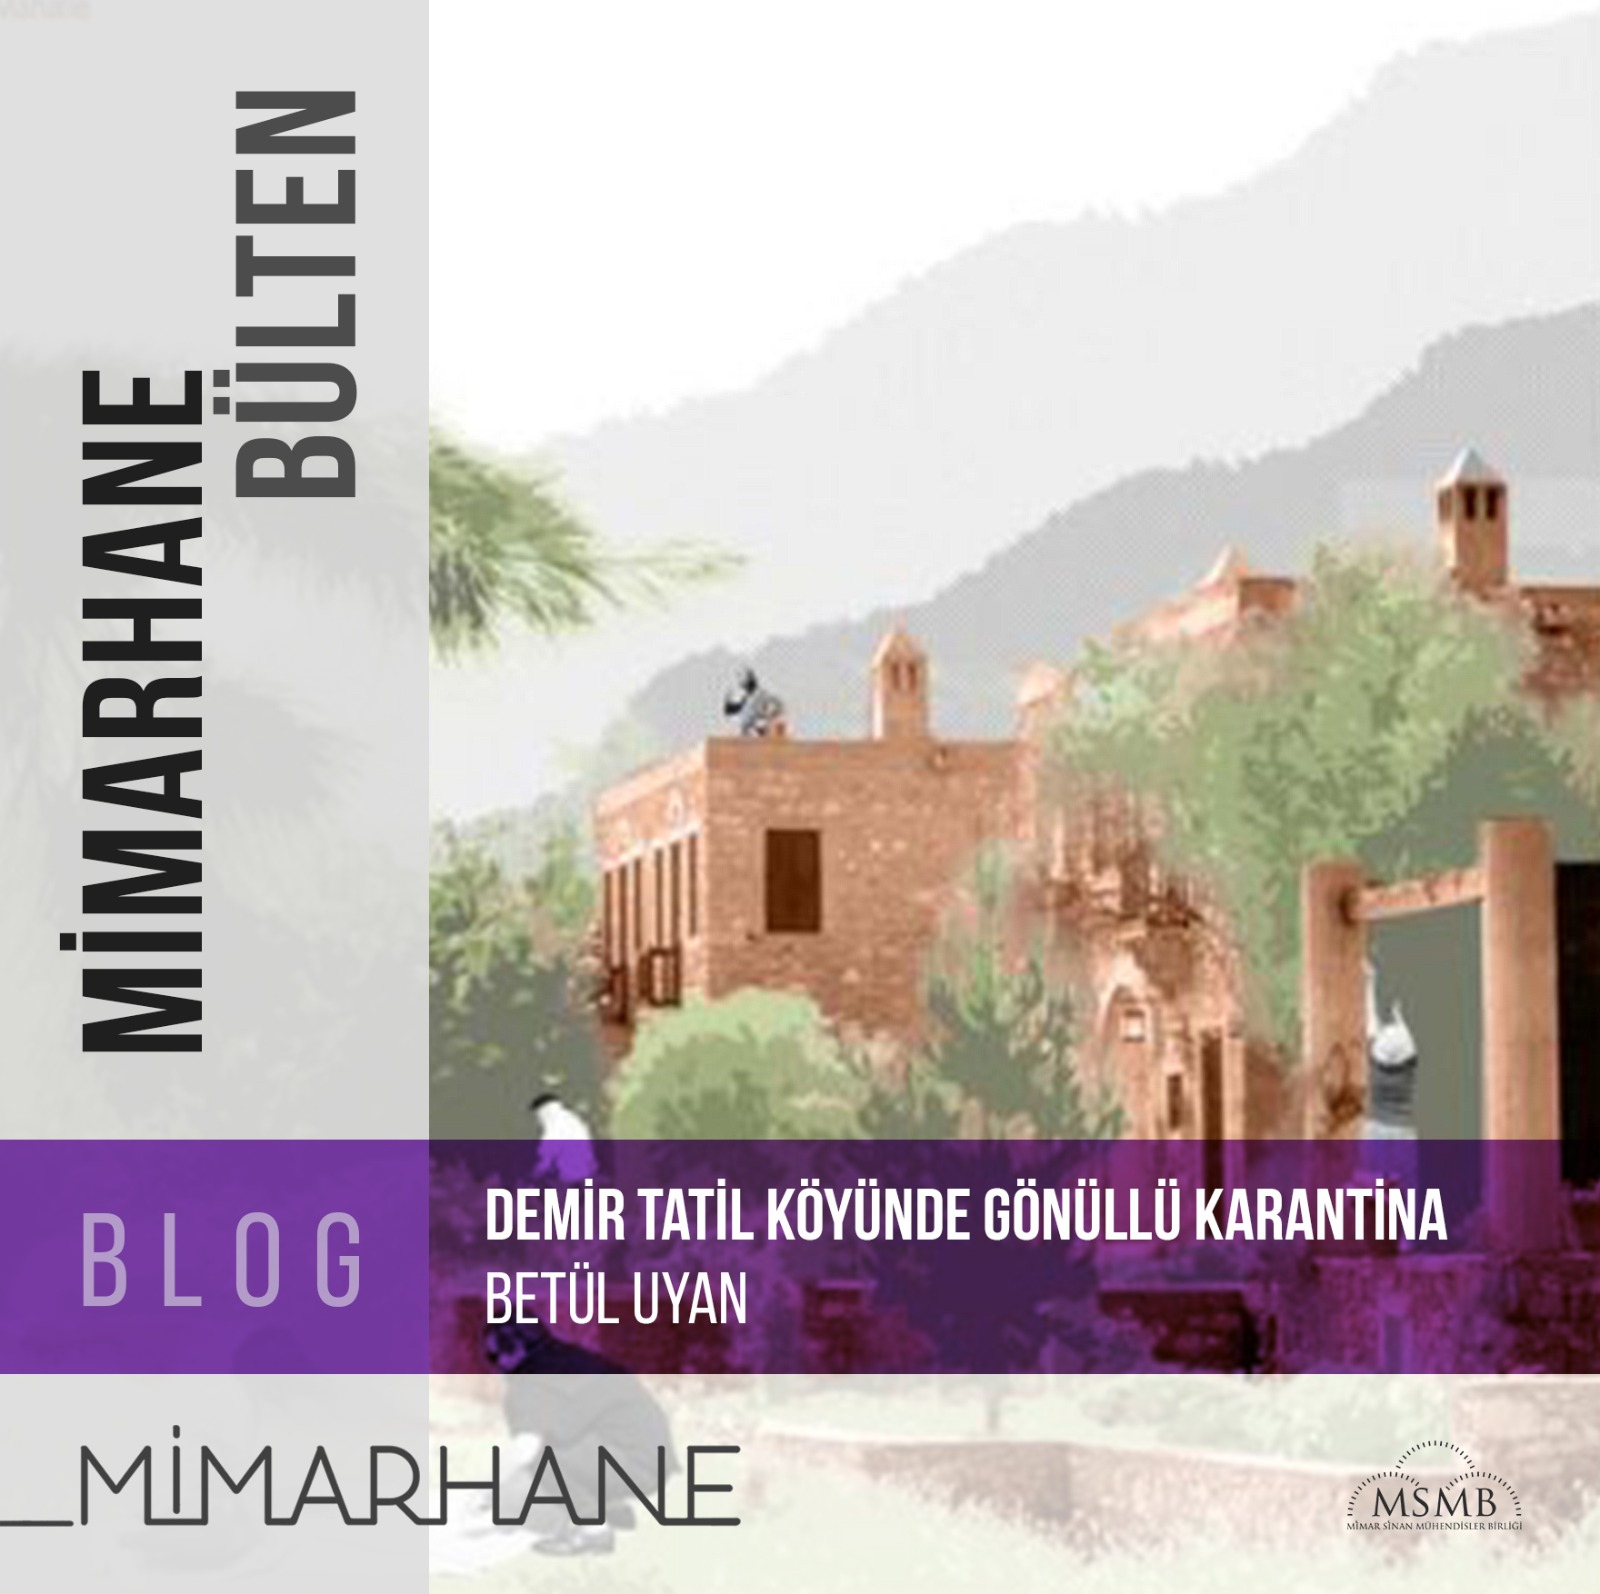 Demir Tatil Köyünde Gönüllü Karantina | Betül Uyan